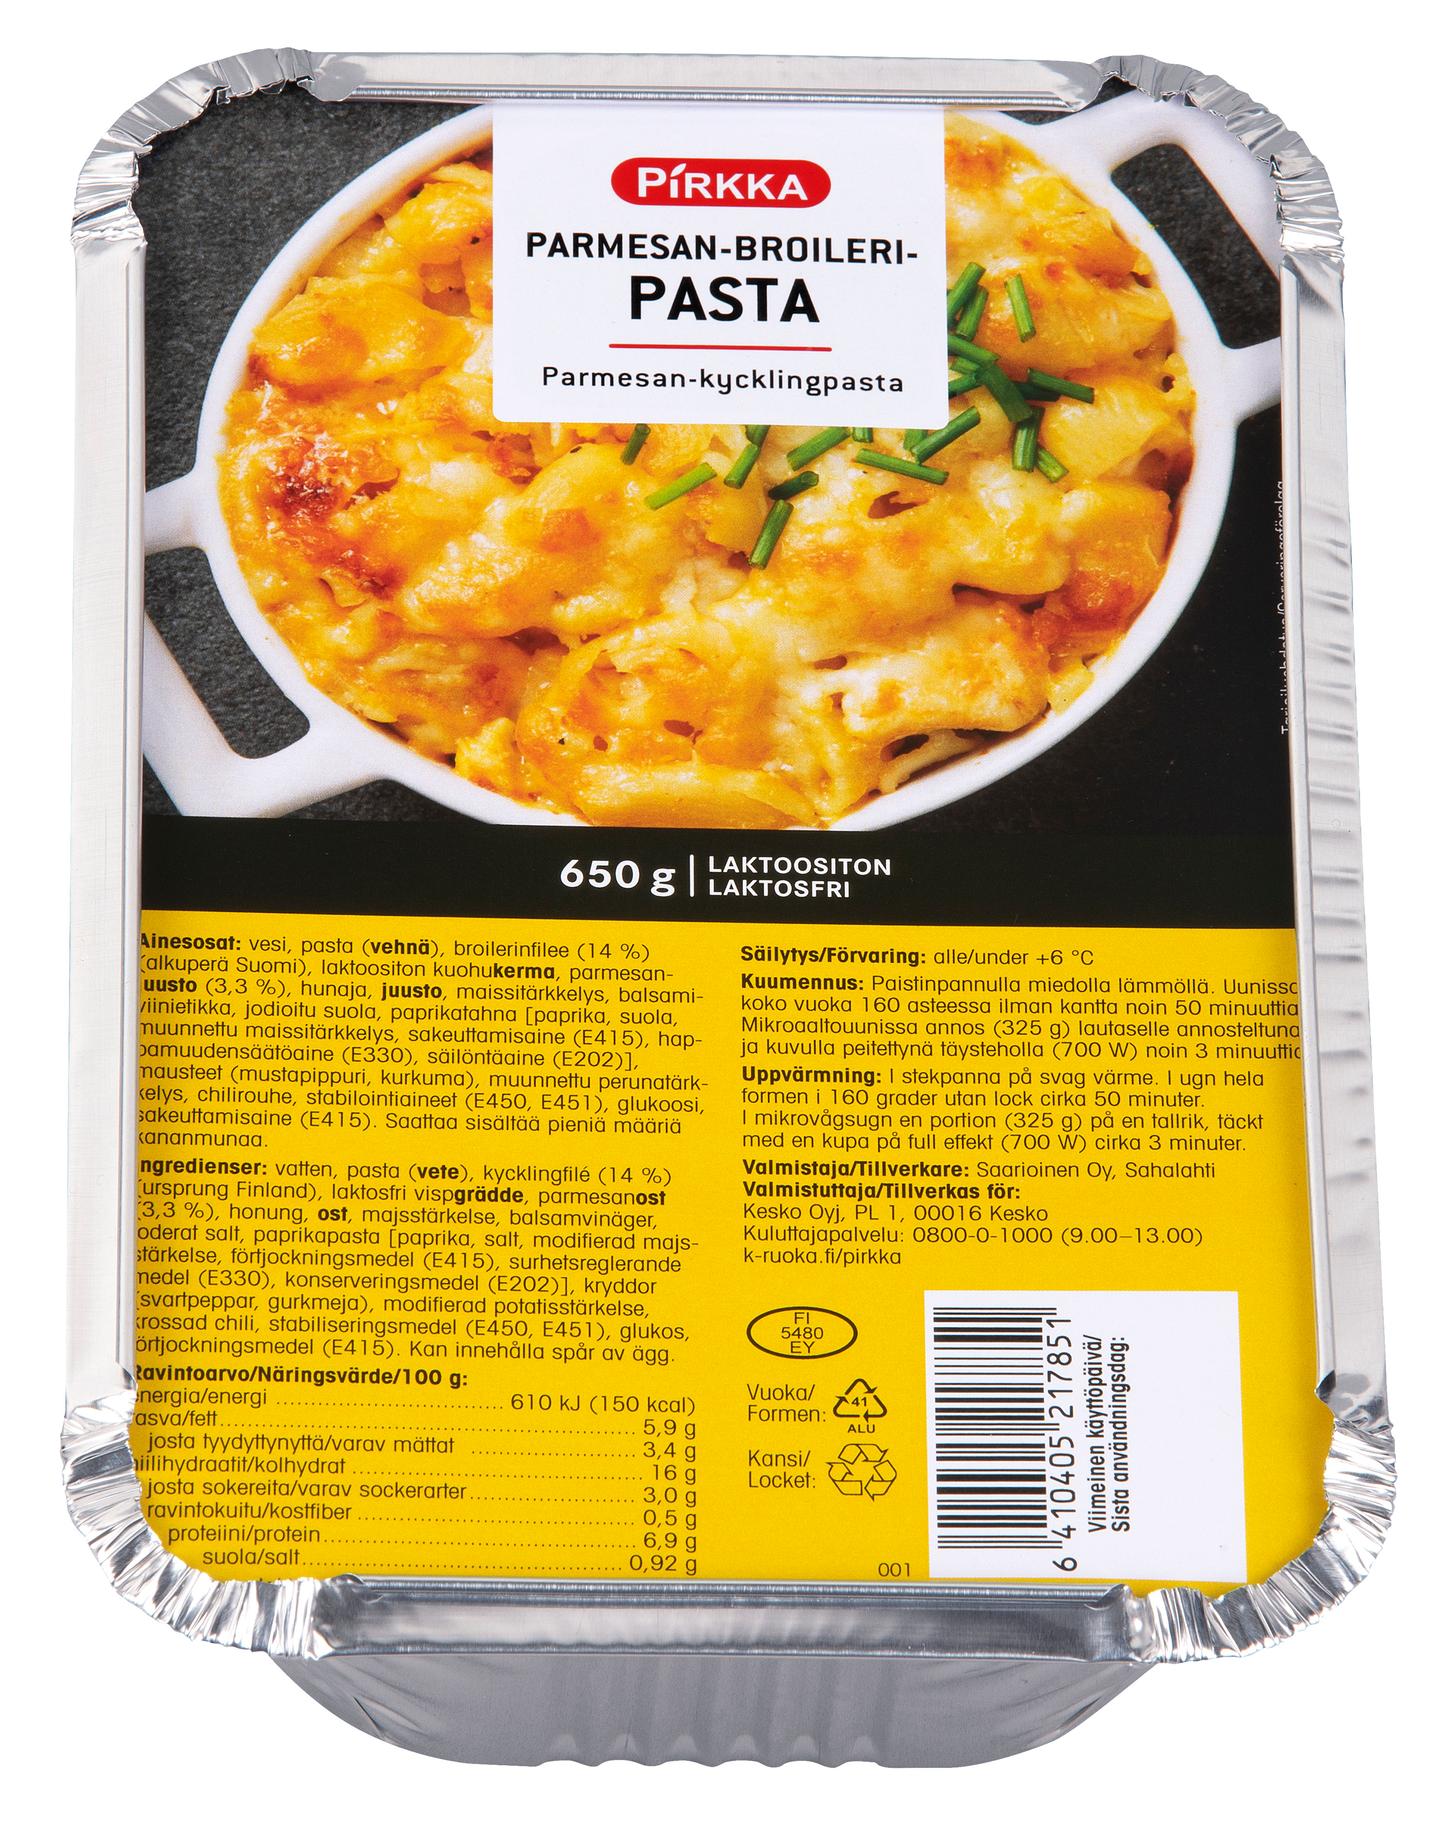 Pirkka Parmesan Broileripasta 650g K Ruoka